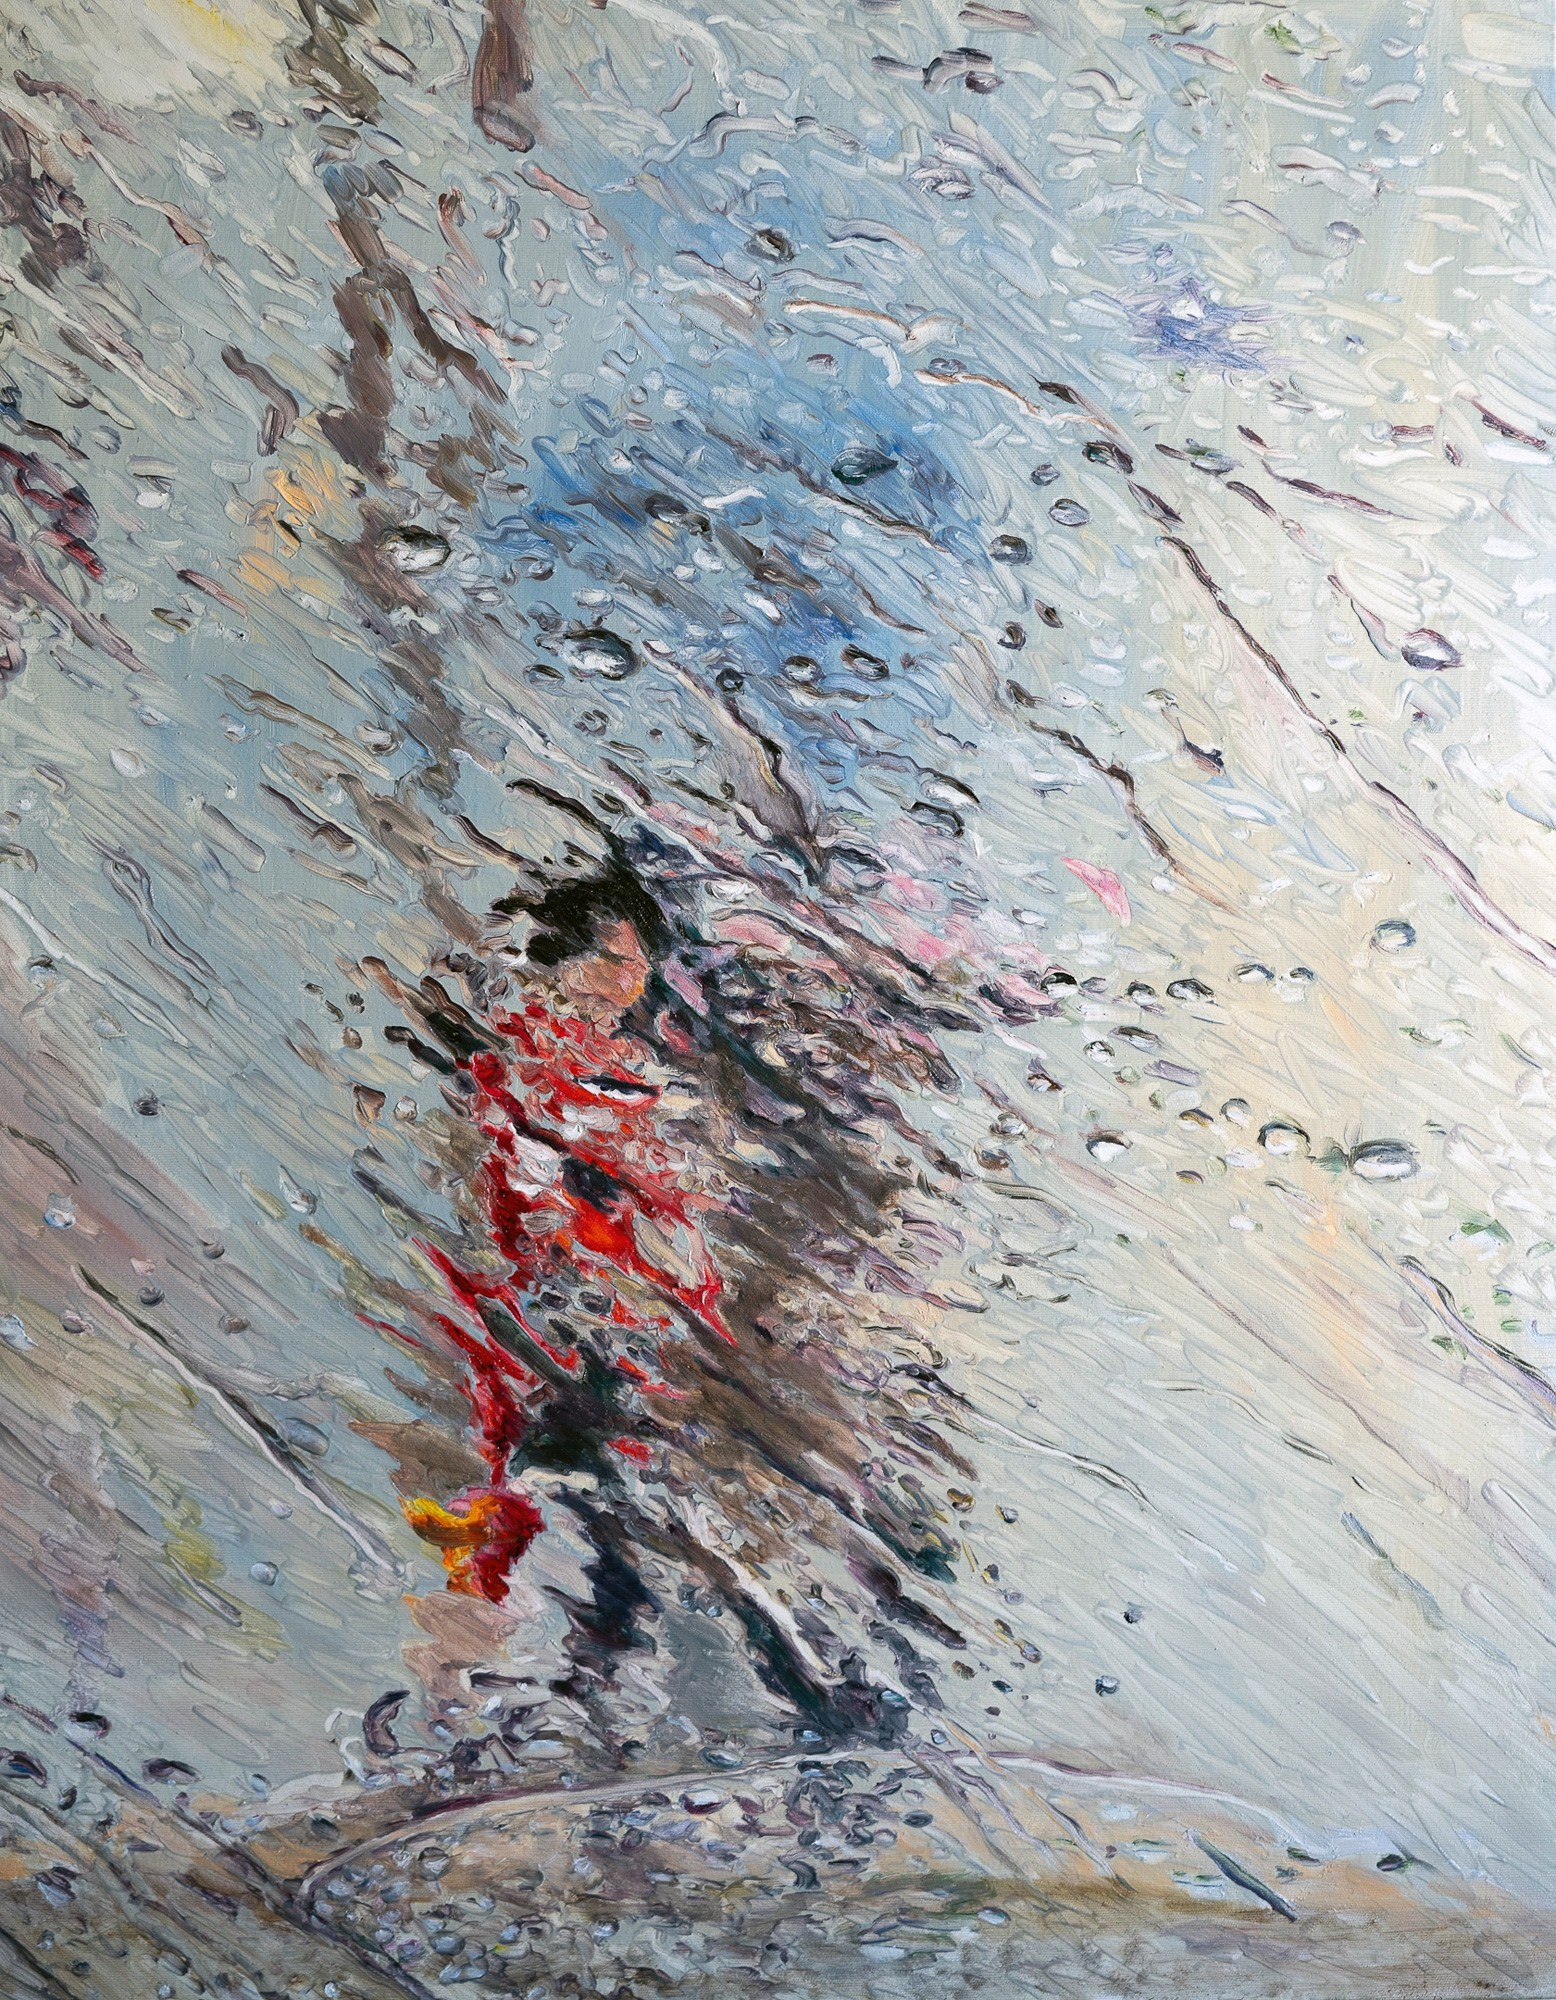 Fluid   Malerei von Künstlerin Simone Westphal, Öl auf Leinwand